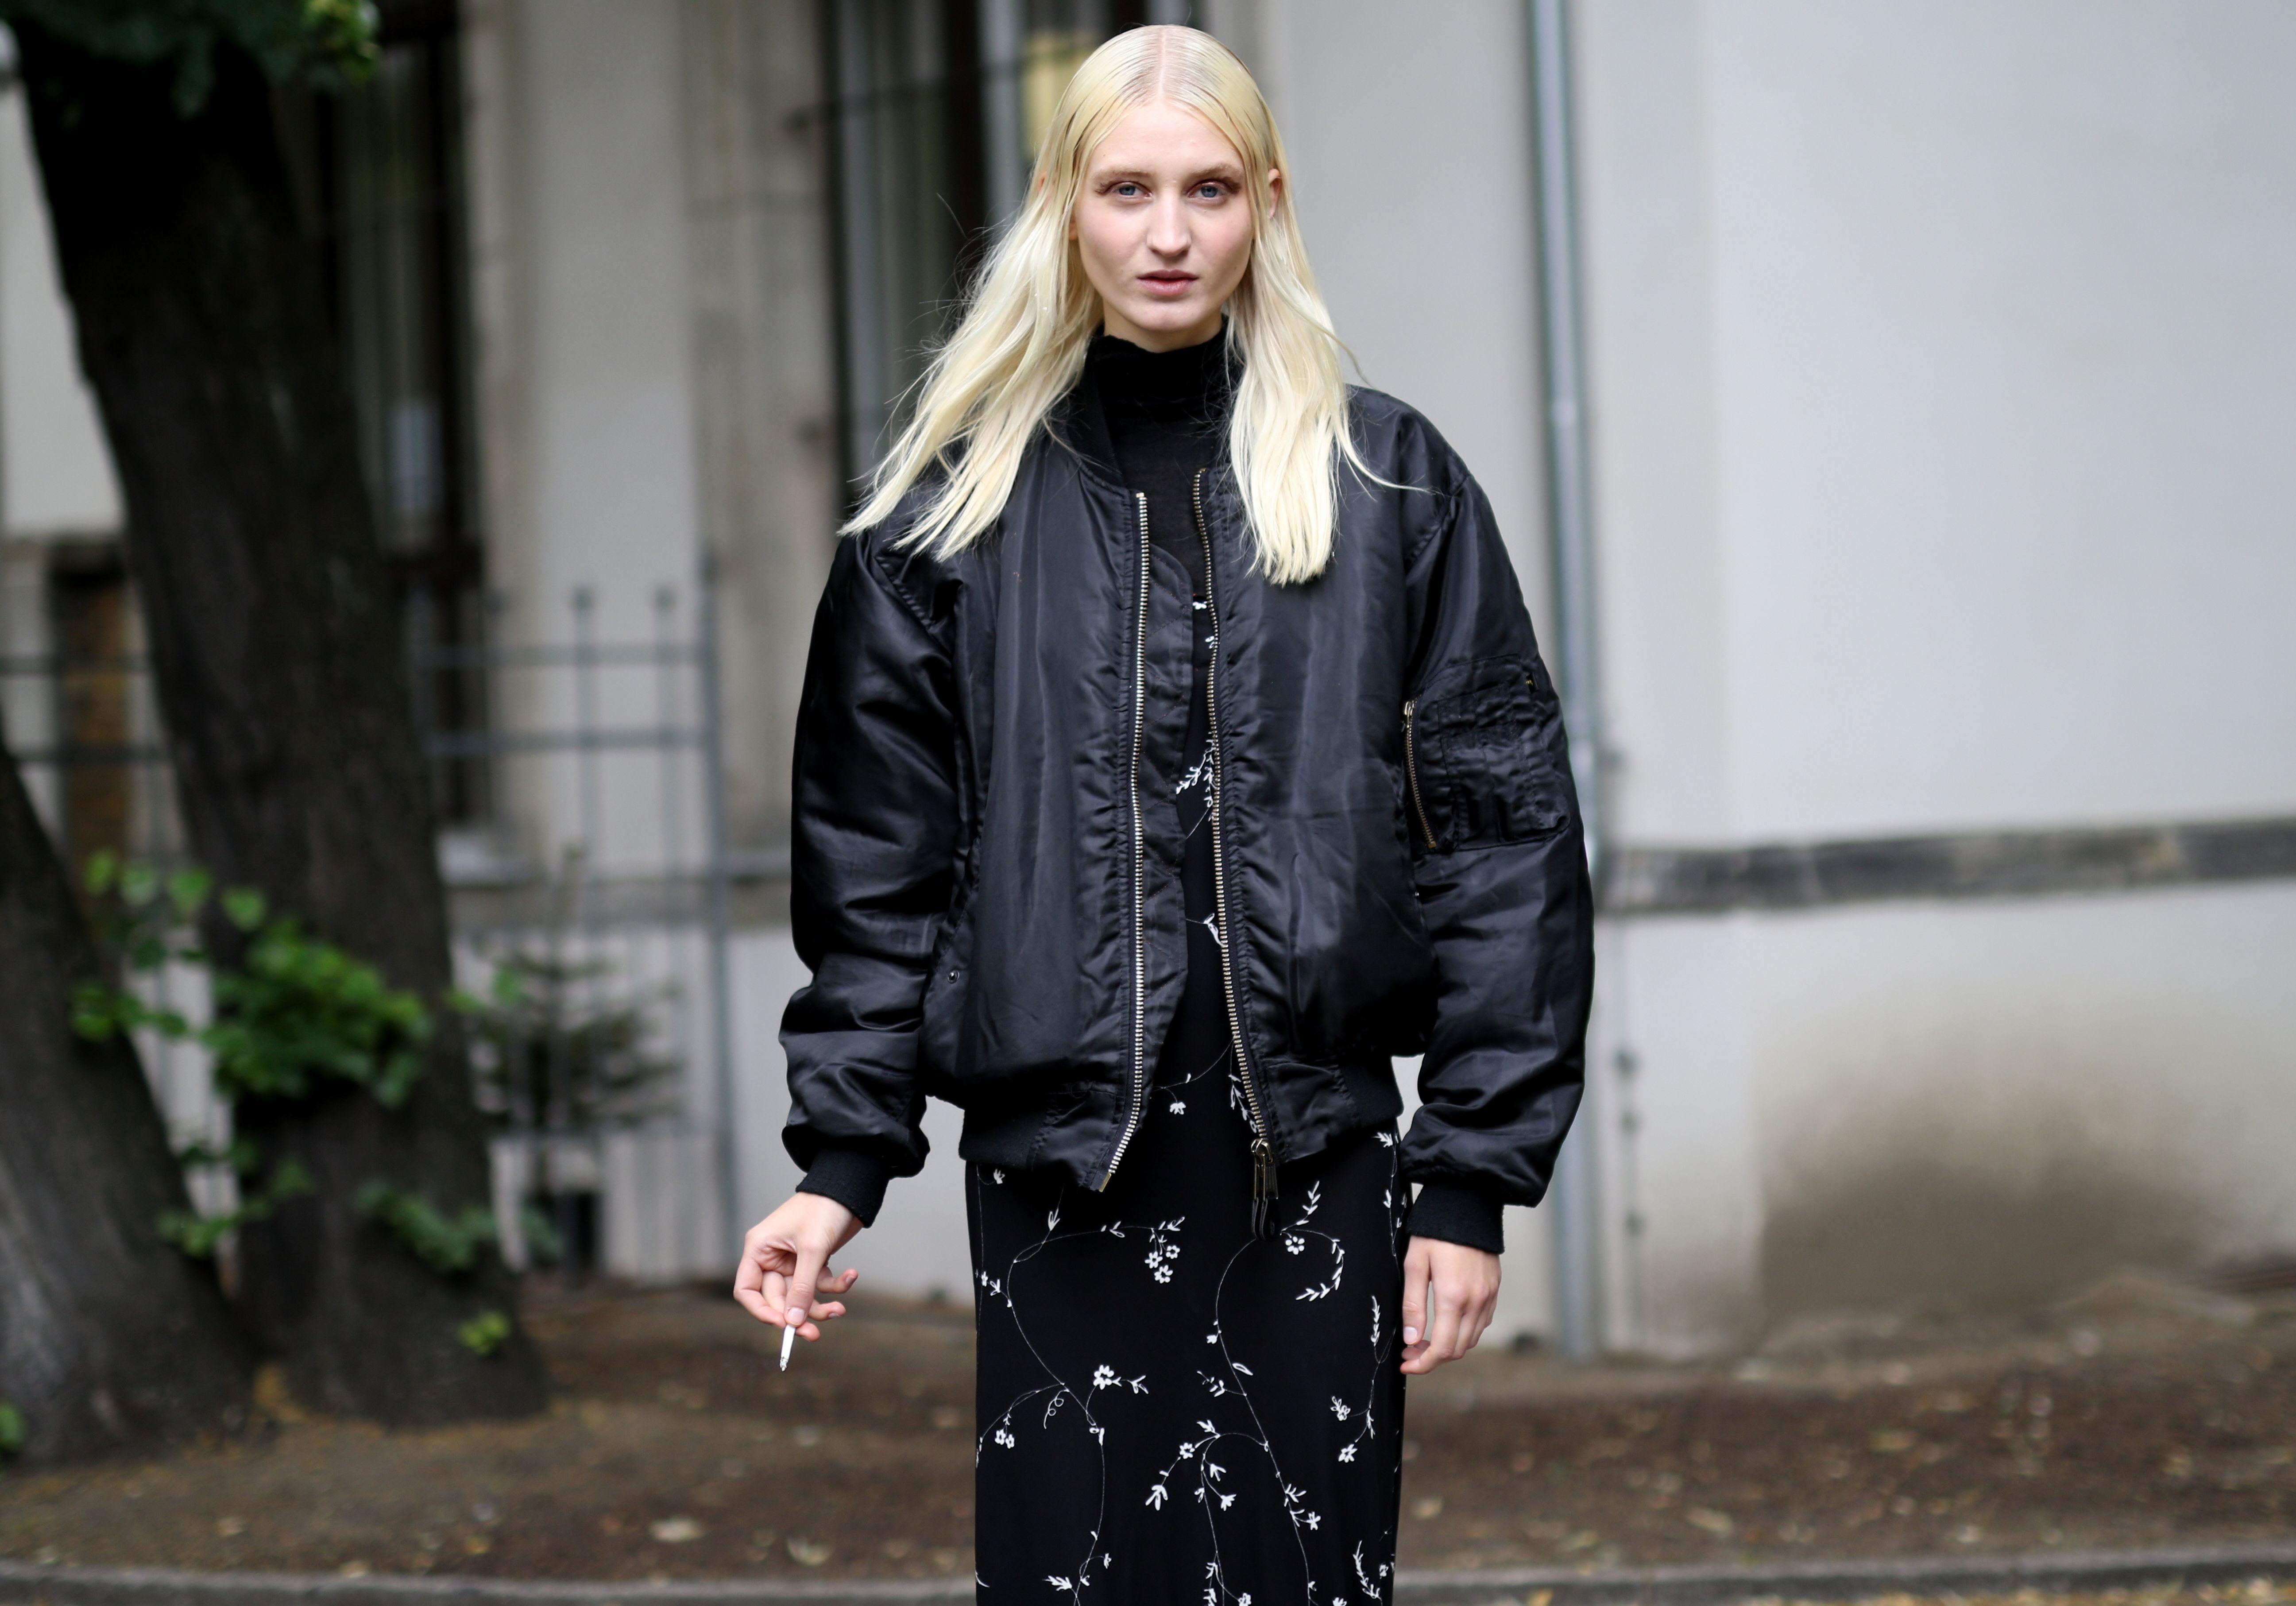 #style #streetstyle #fashion #streetfashion #street #fashionweek #berlin #mbfw #mbfwb #moda #mode #model #models #modelofduty #modelo #black #jacket